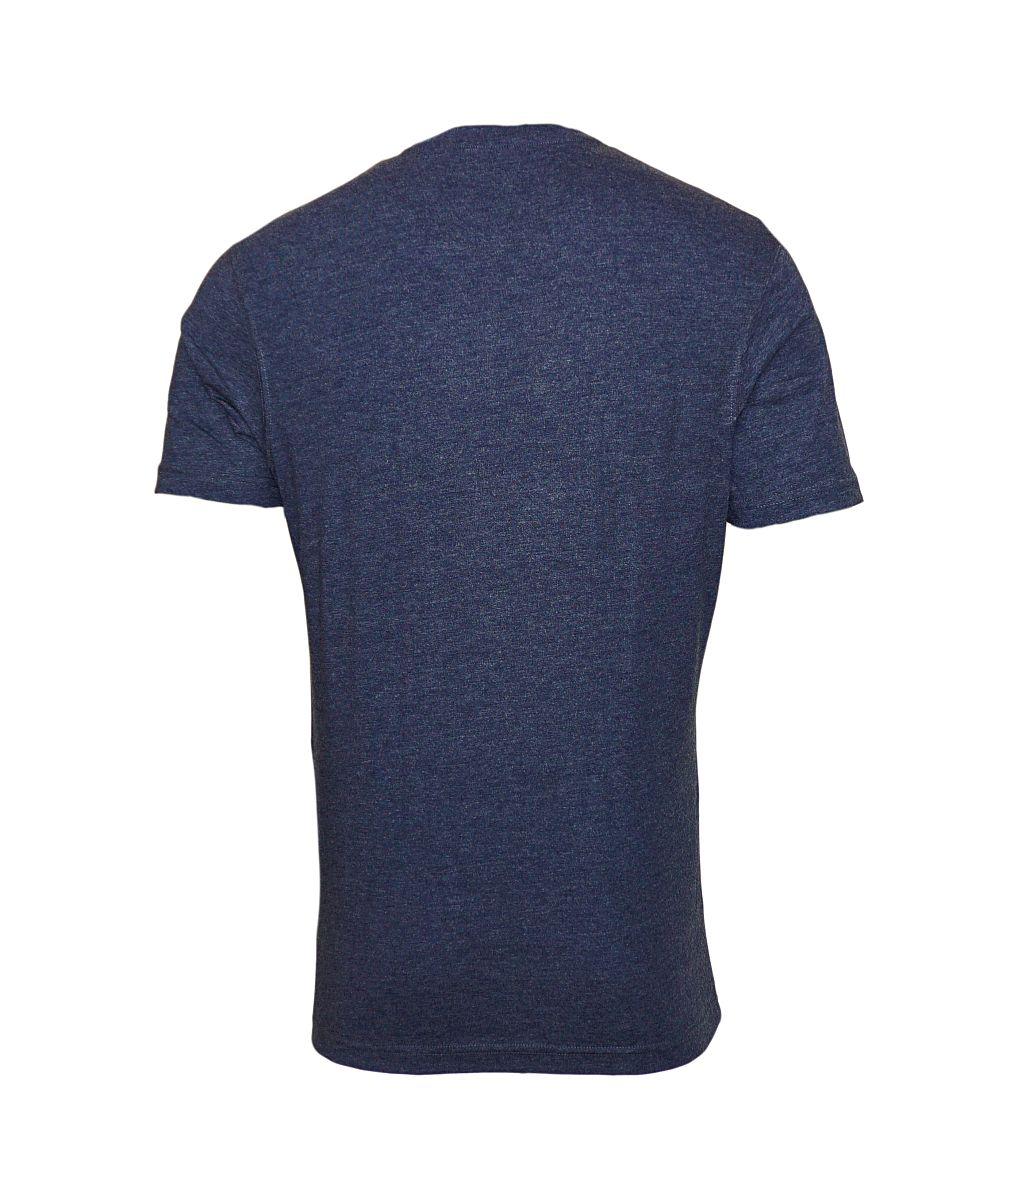 Daniel Hechter 2er Pack T-Shirts V-Ausschnitt 76002 172972 680 blau melange SH17-DH2P